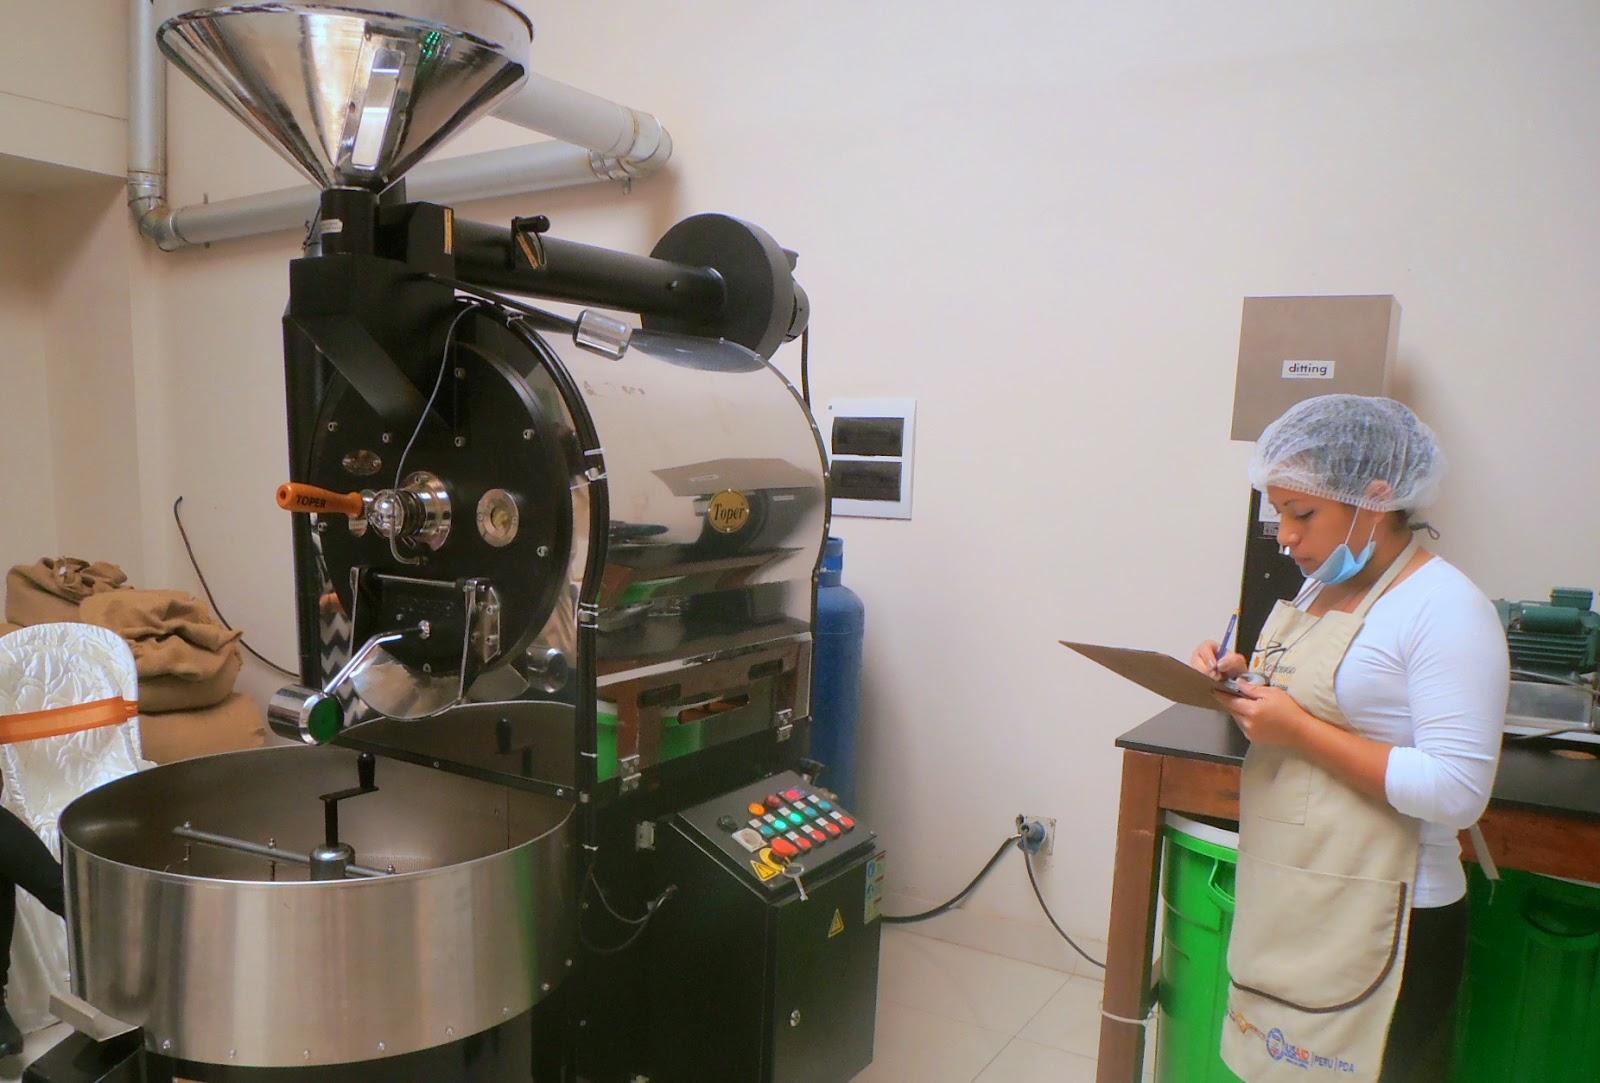 Estandarizan producción de café especial - Innóvate Perú